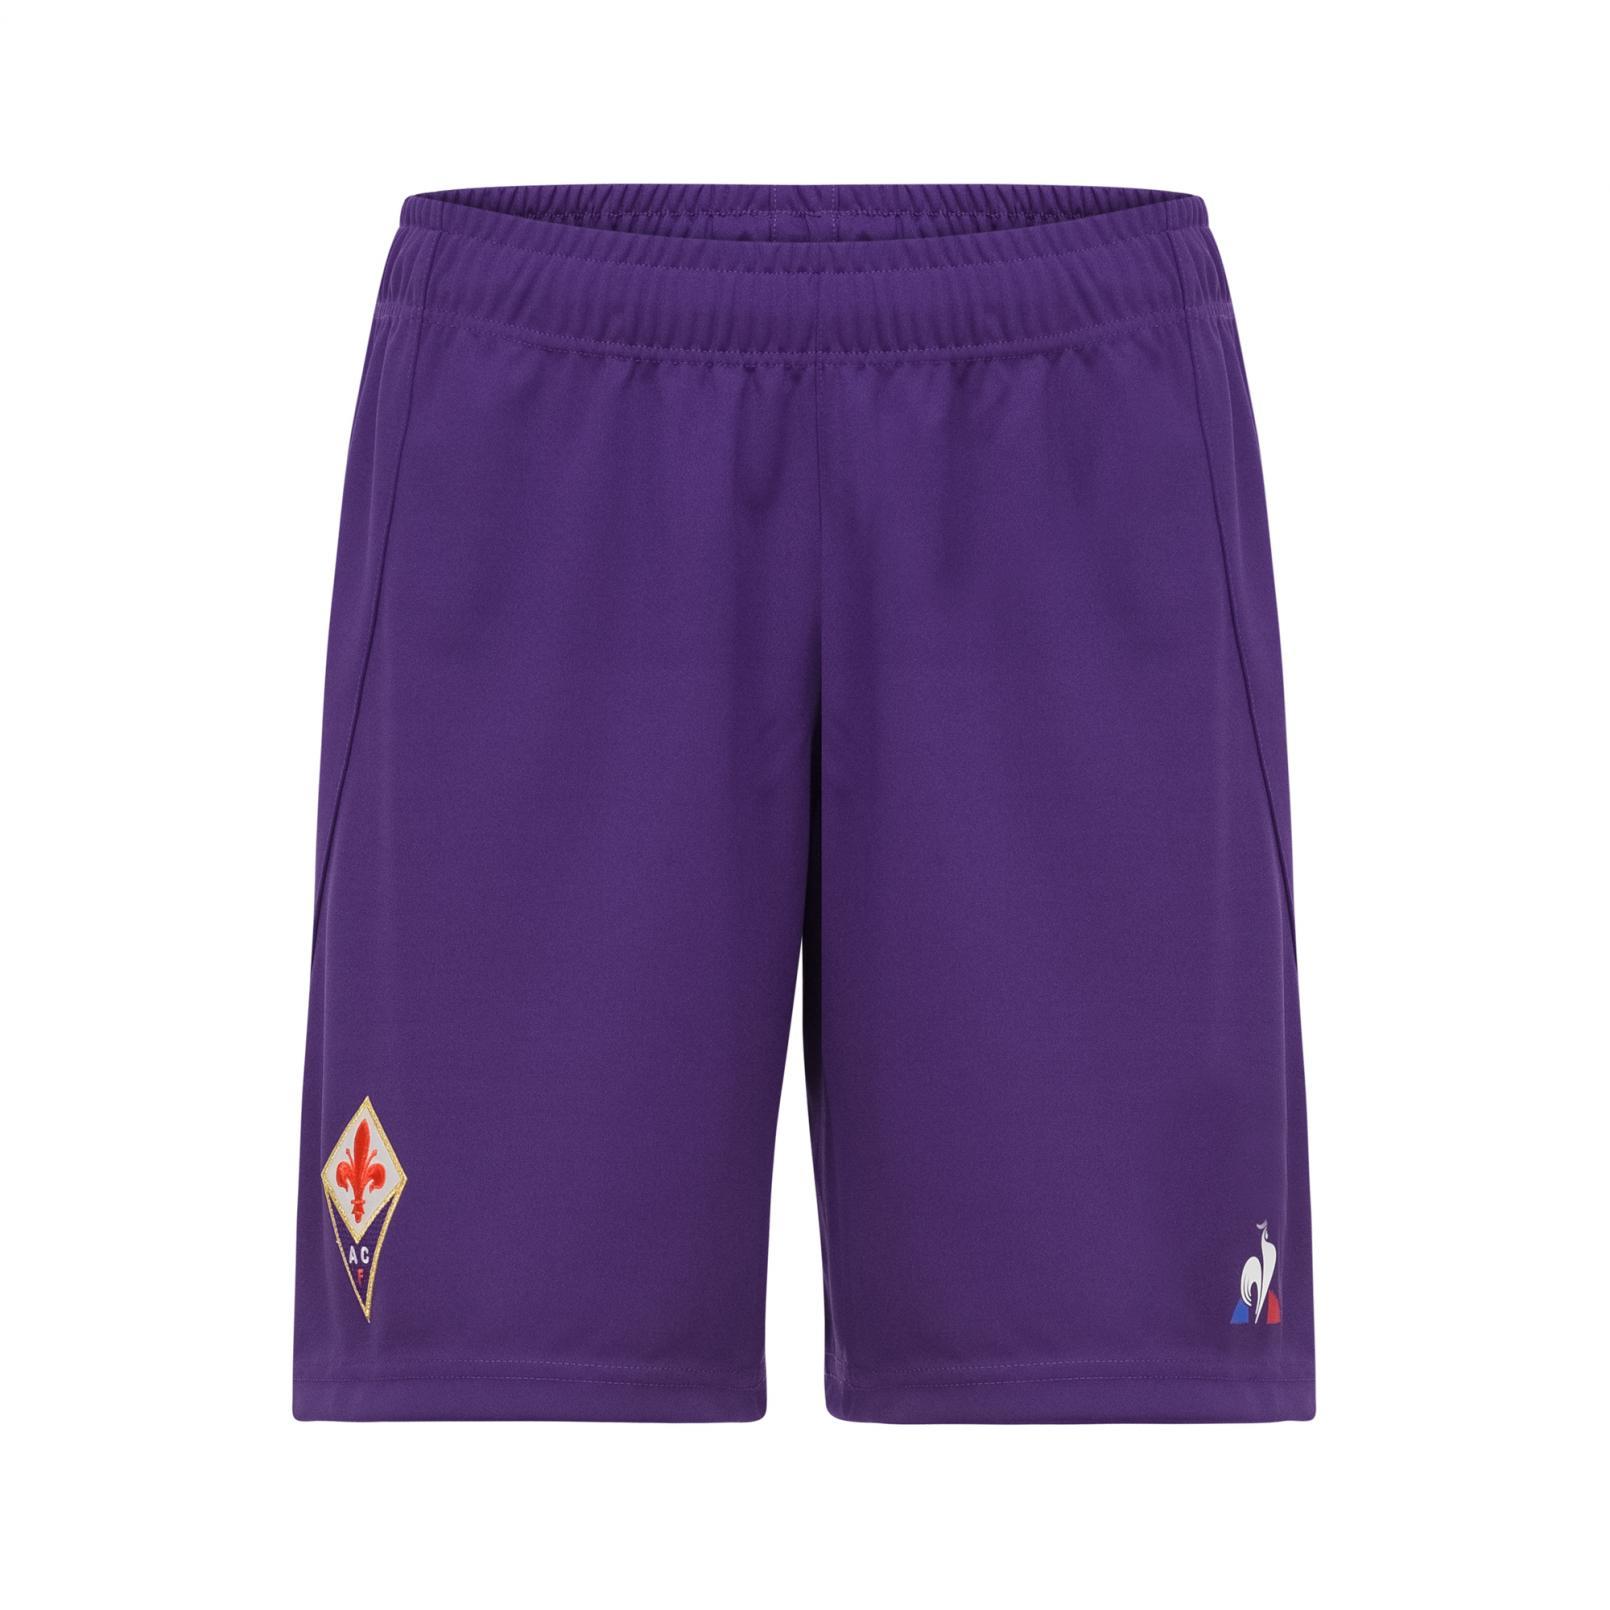 Shorts – Le Coq Sportif Fiorentina Training Short Purple